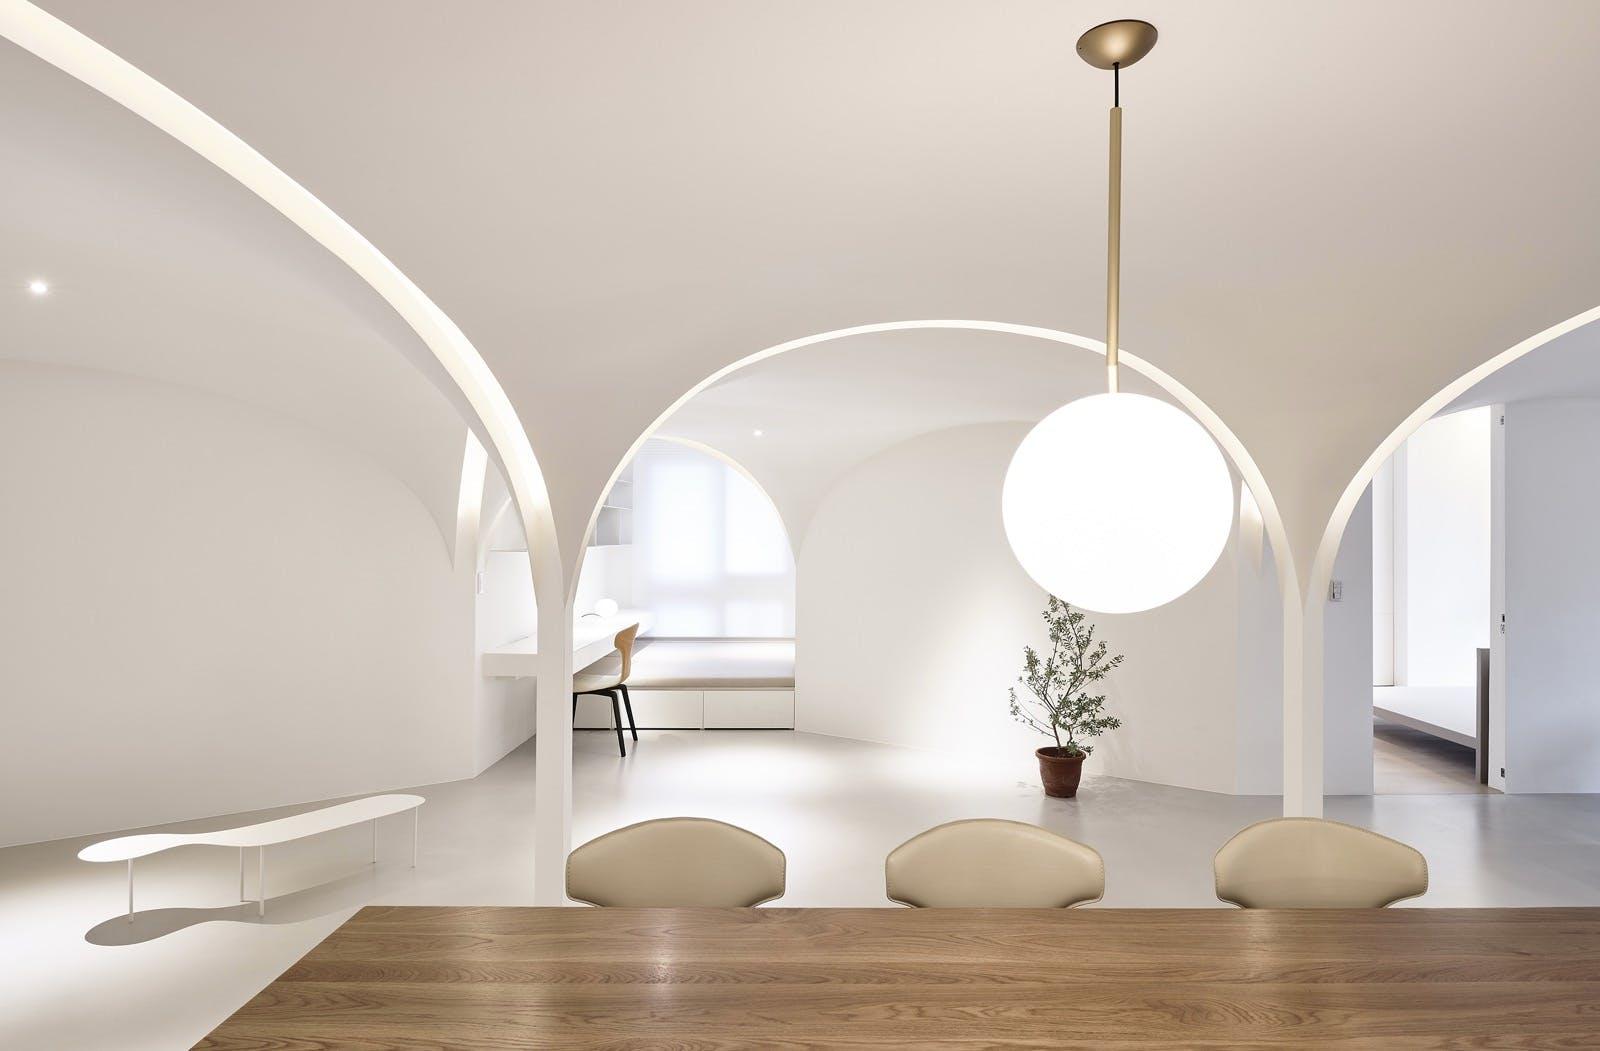 Six more winners of 2018 INSIDE World Festival of Interiors